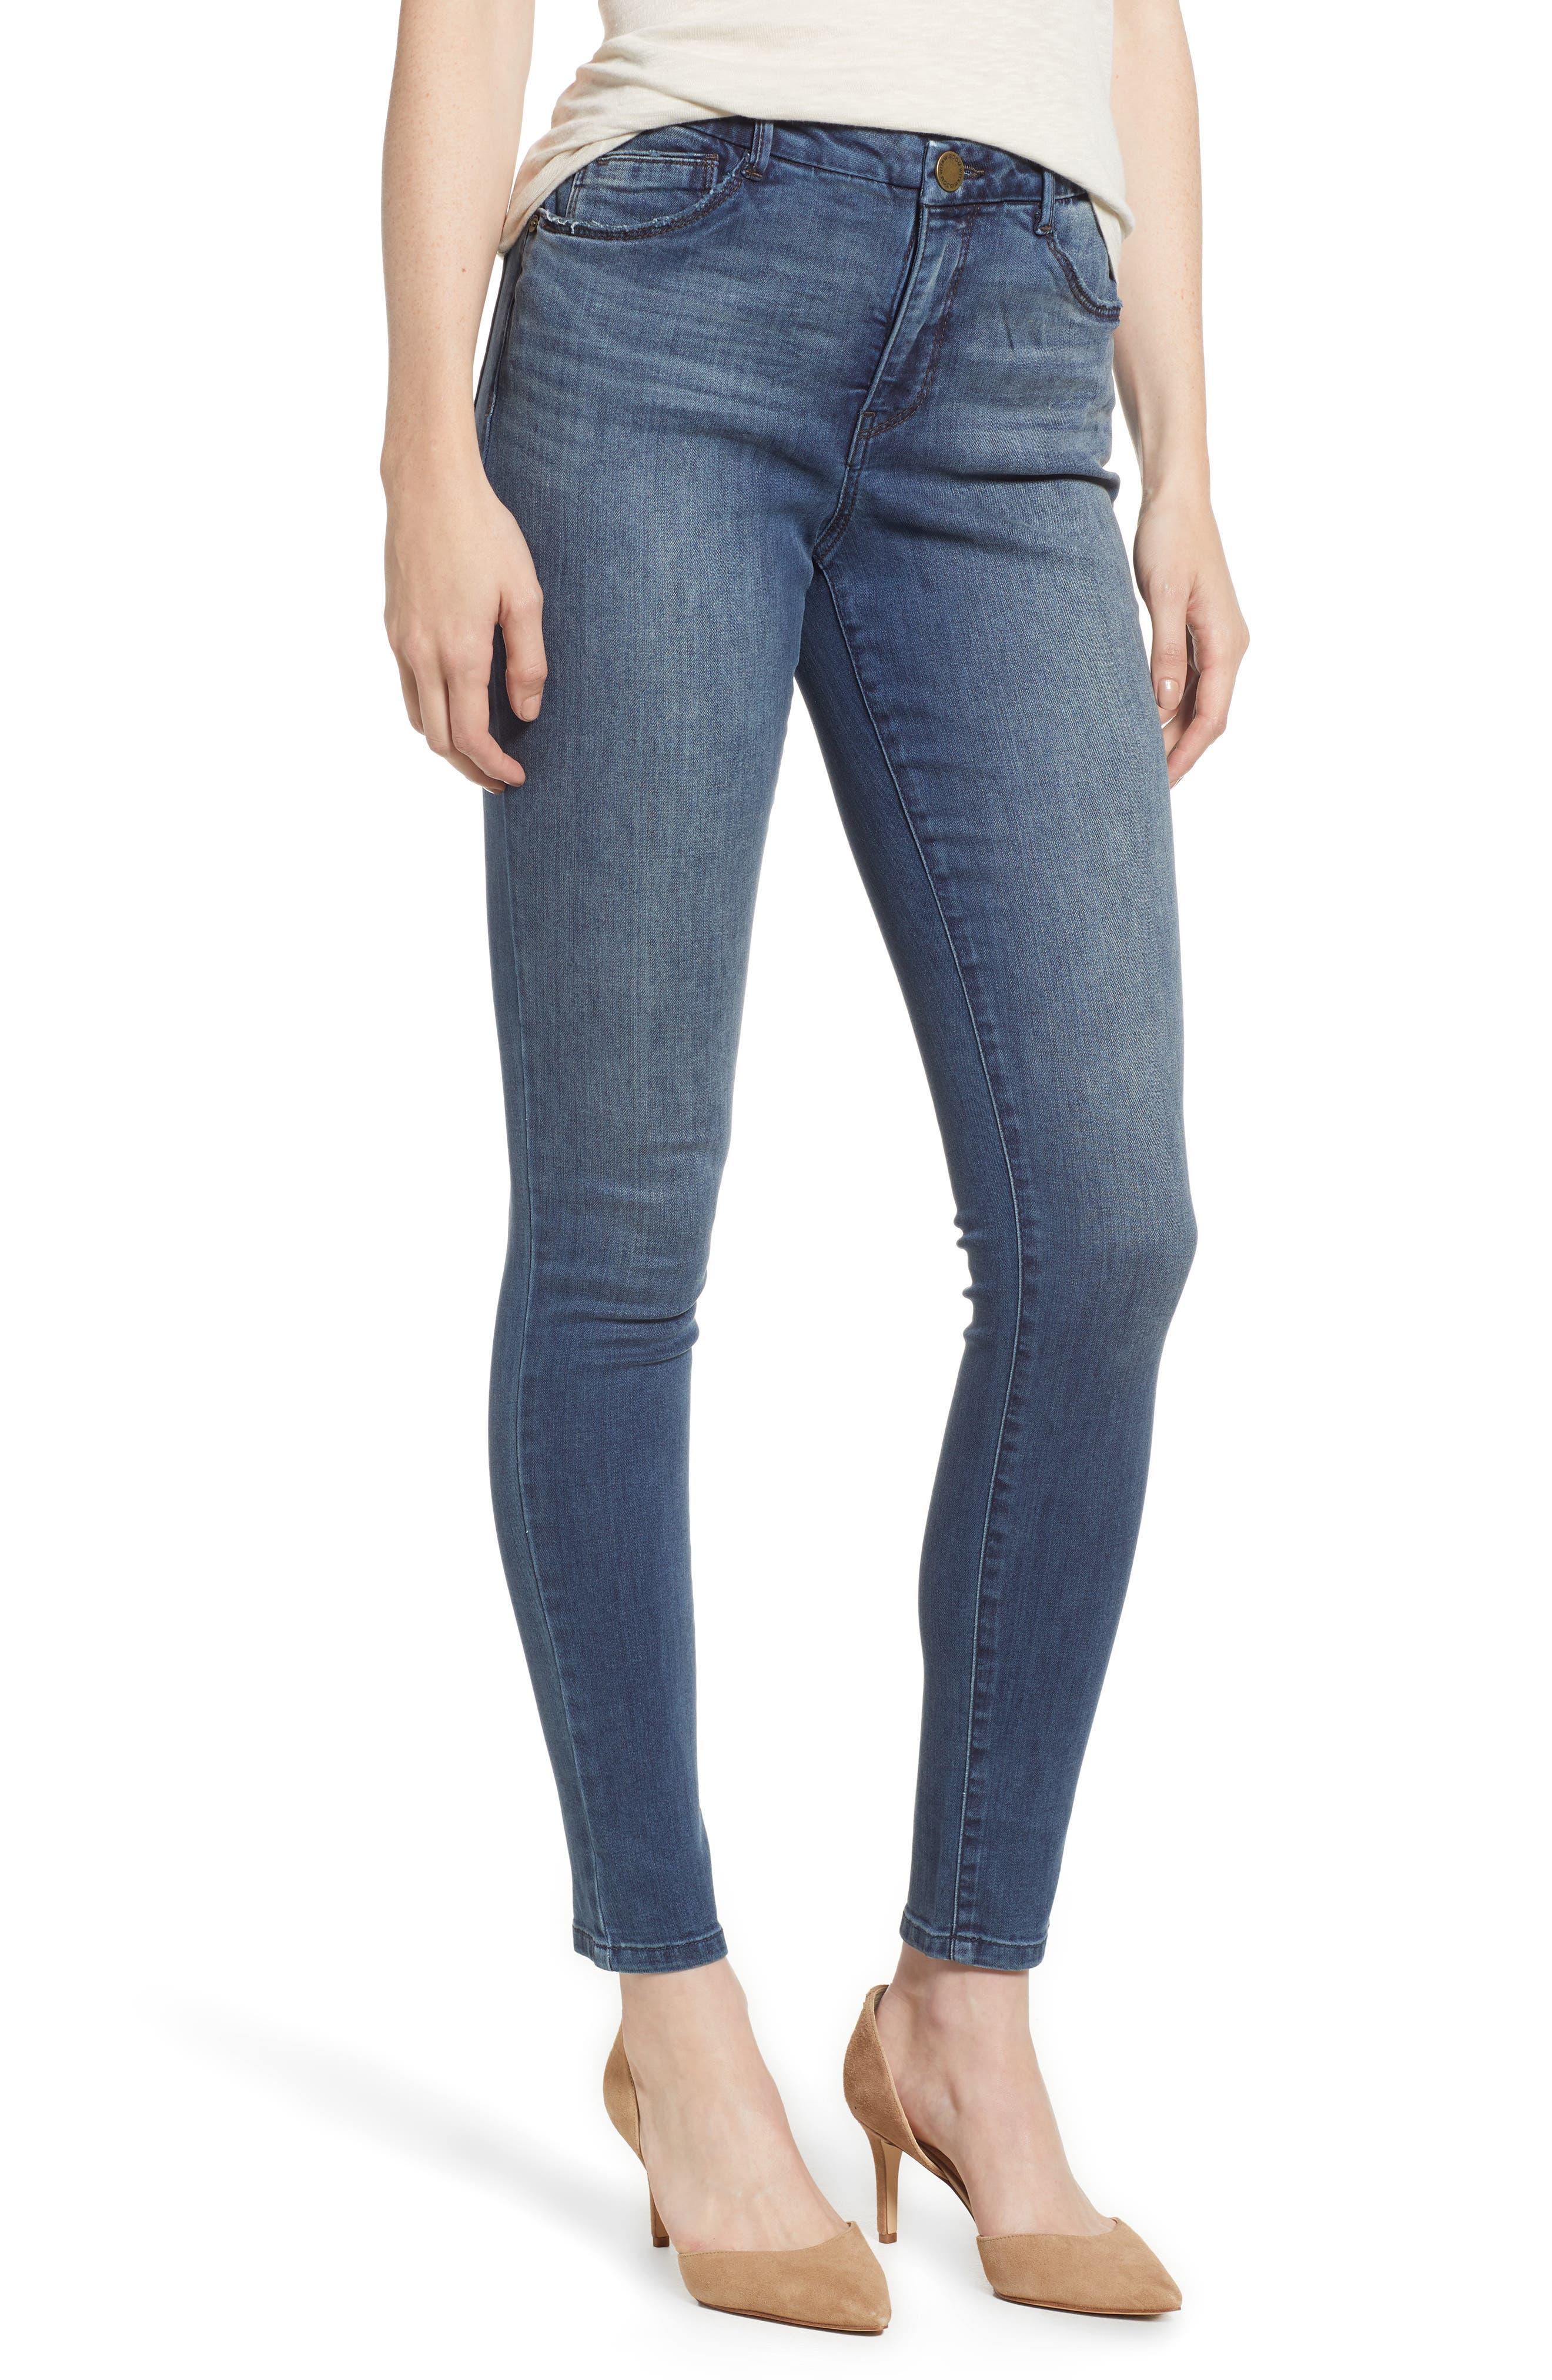 Ab-Solution High Waist Skinny Jeans,                             Main thumbnail 1, color,                             420